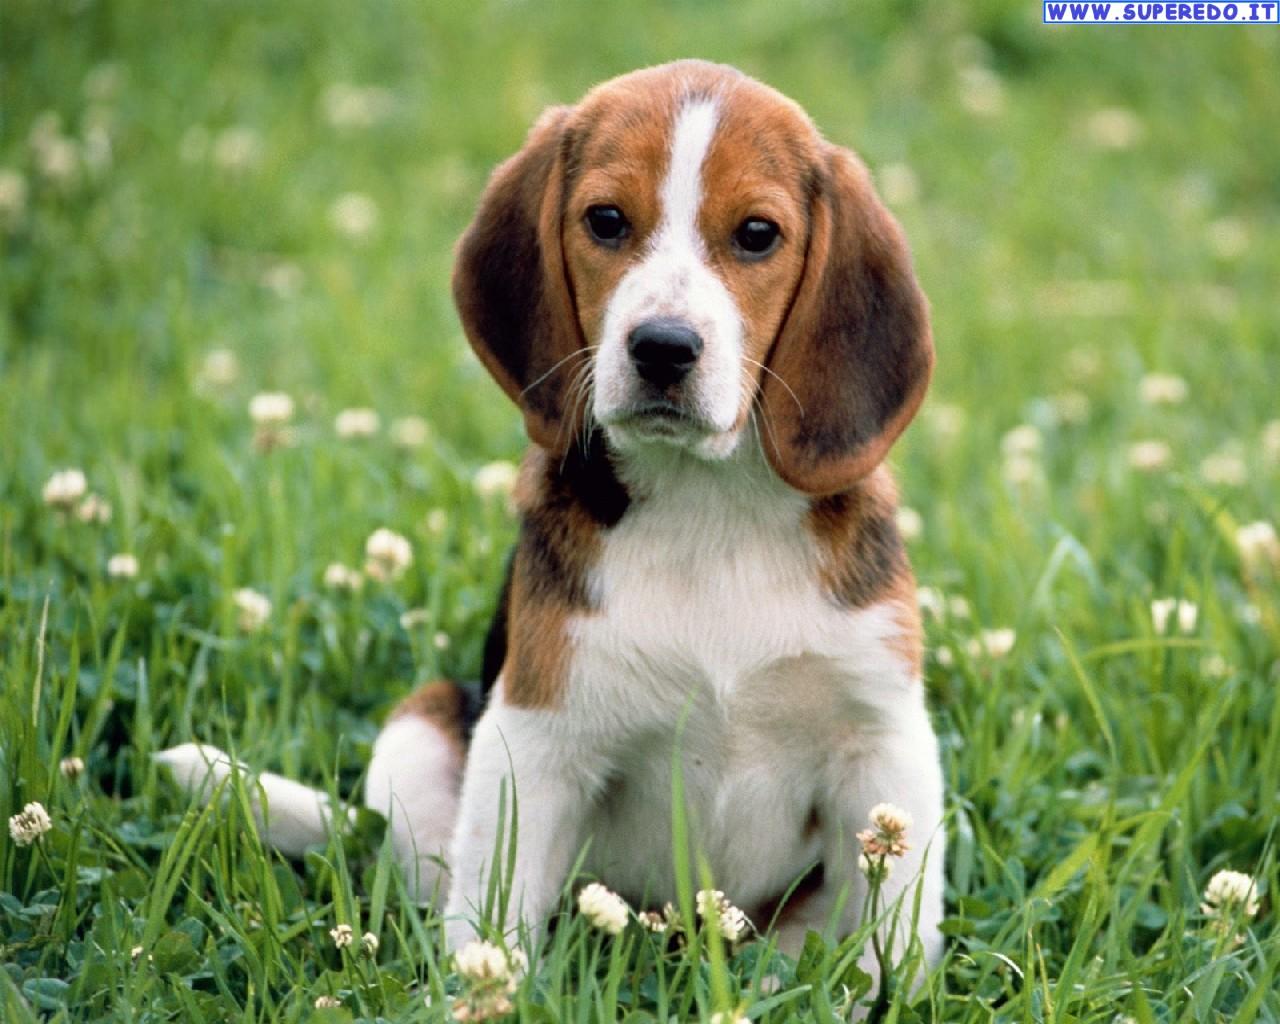 Incentivi per adozione cani